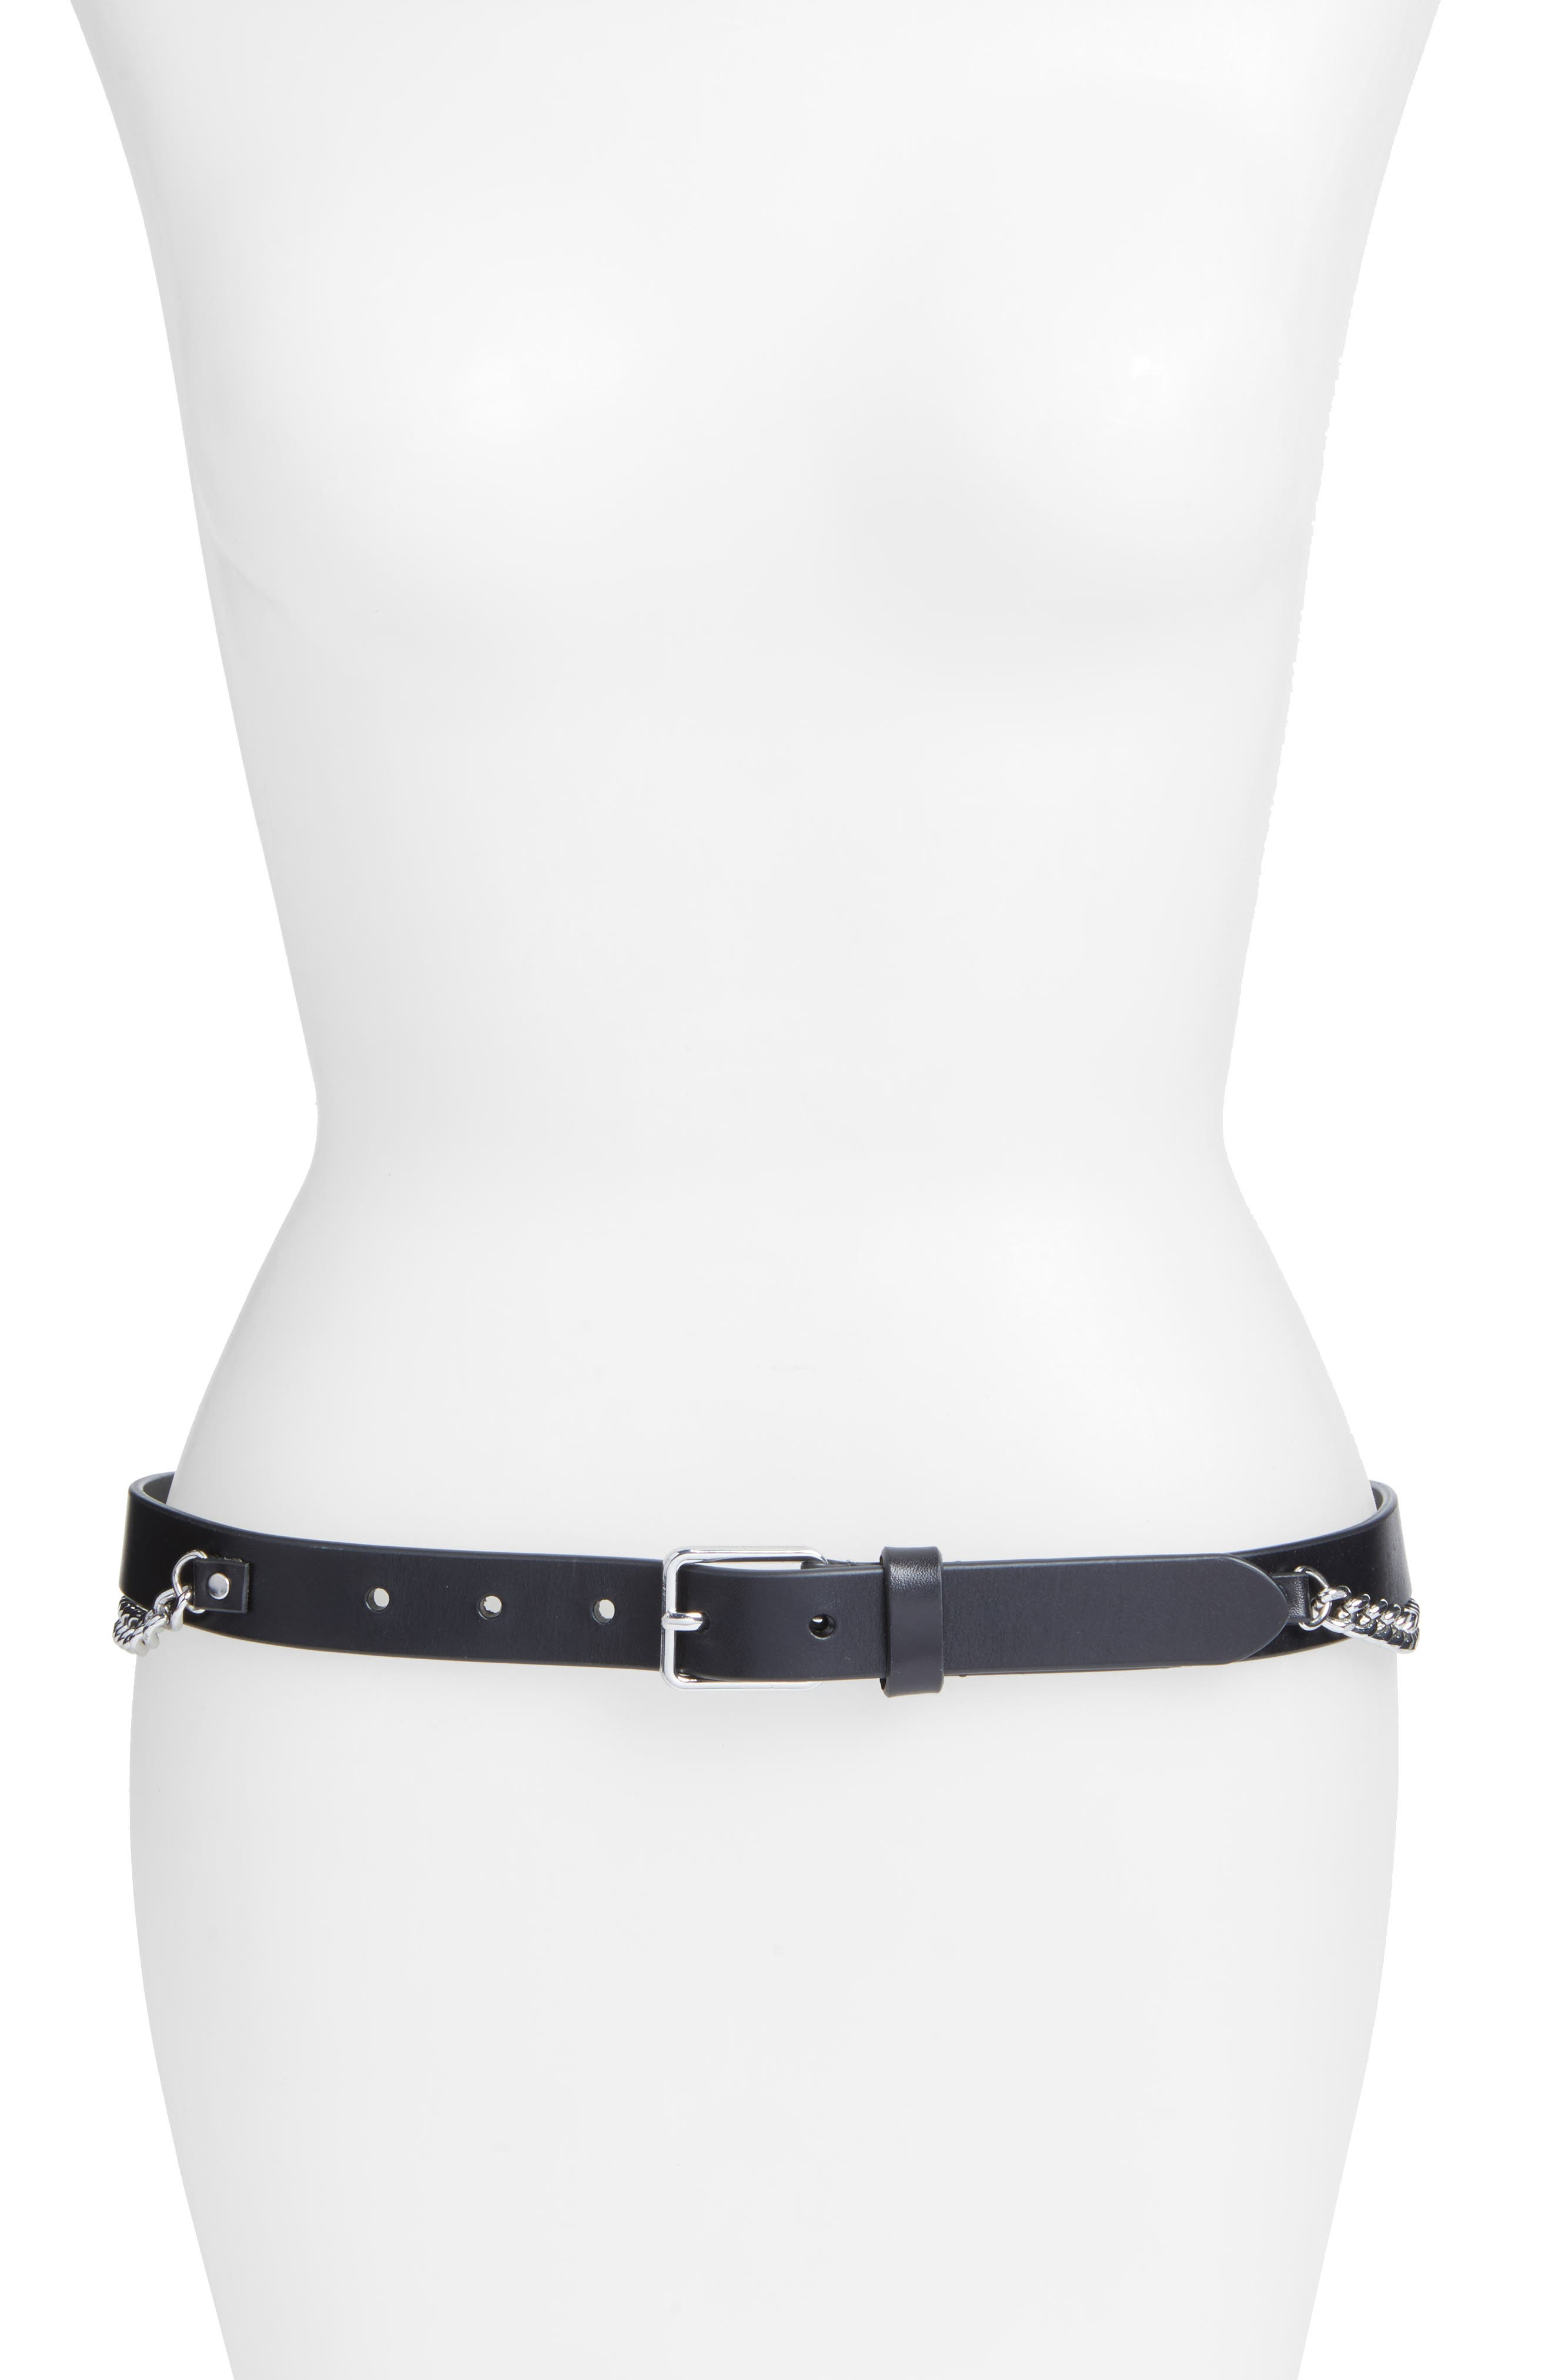 Farah Skinny Calfskin Leather Belt,                             Main thumbnail 1, color,                             001